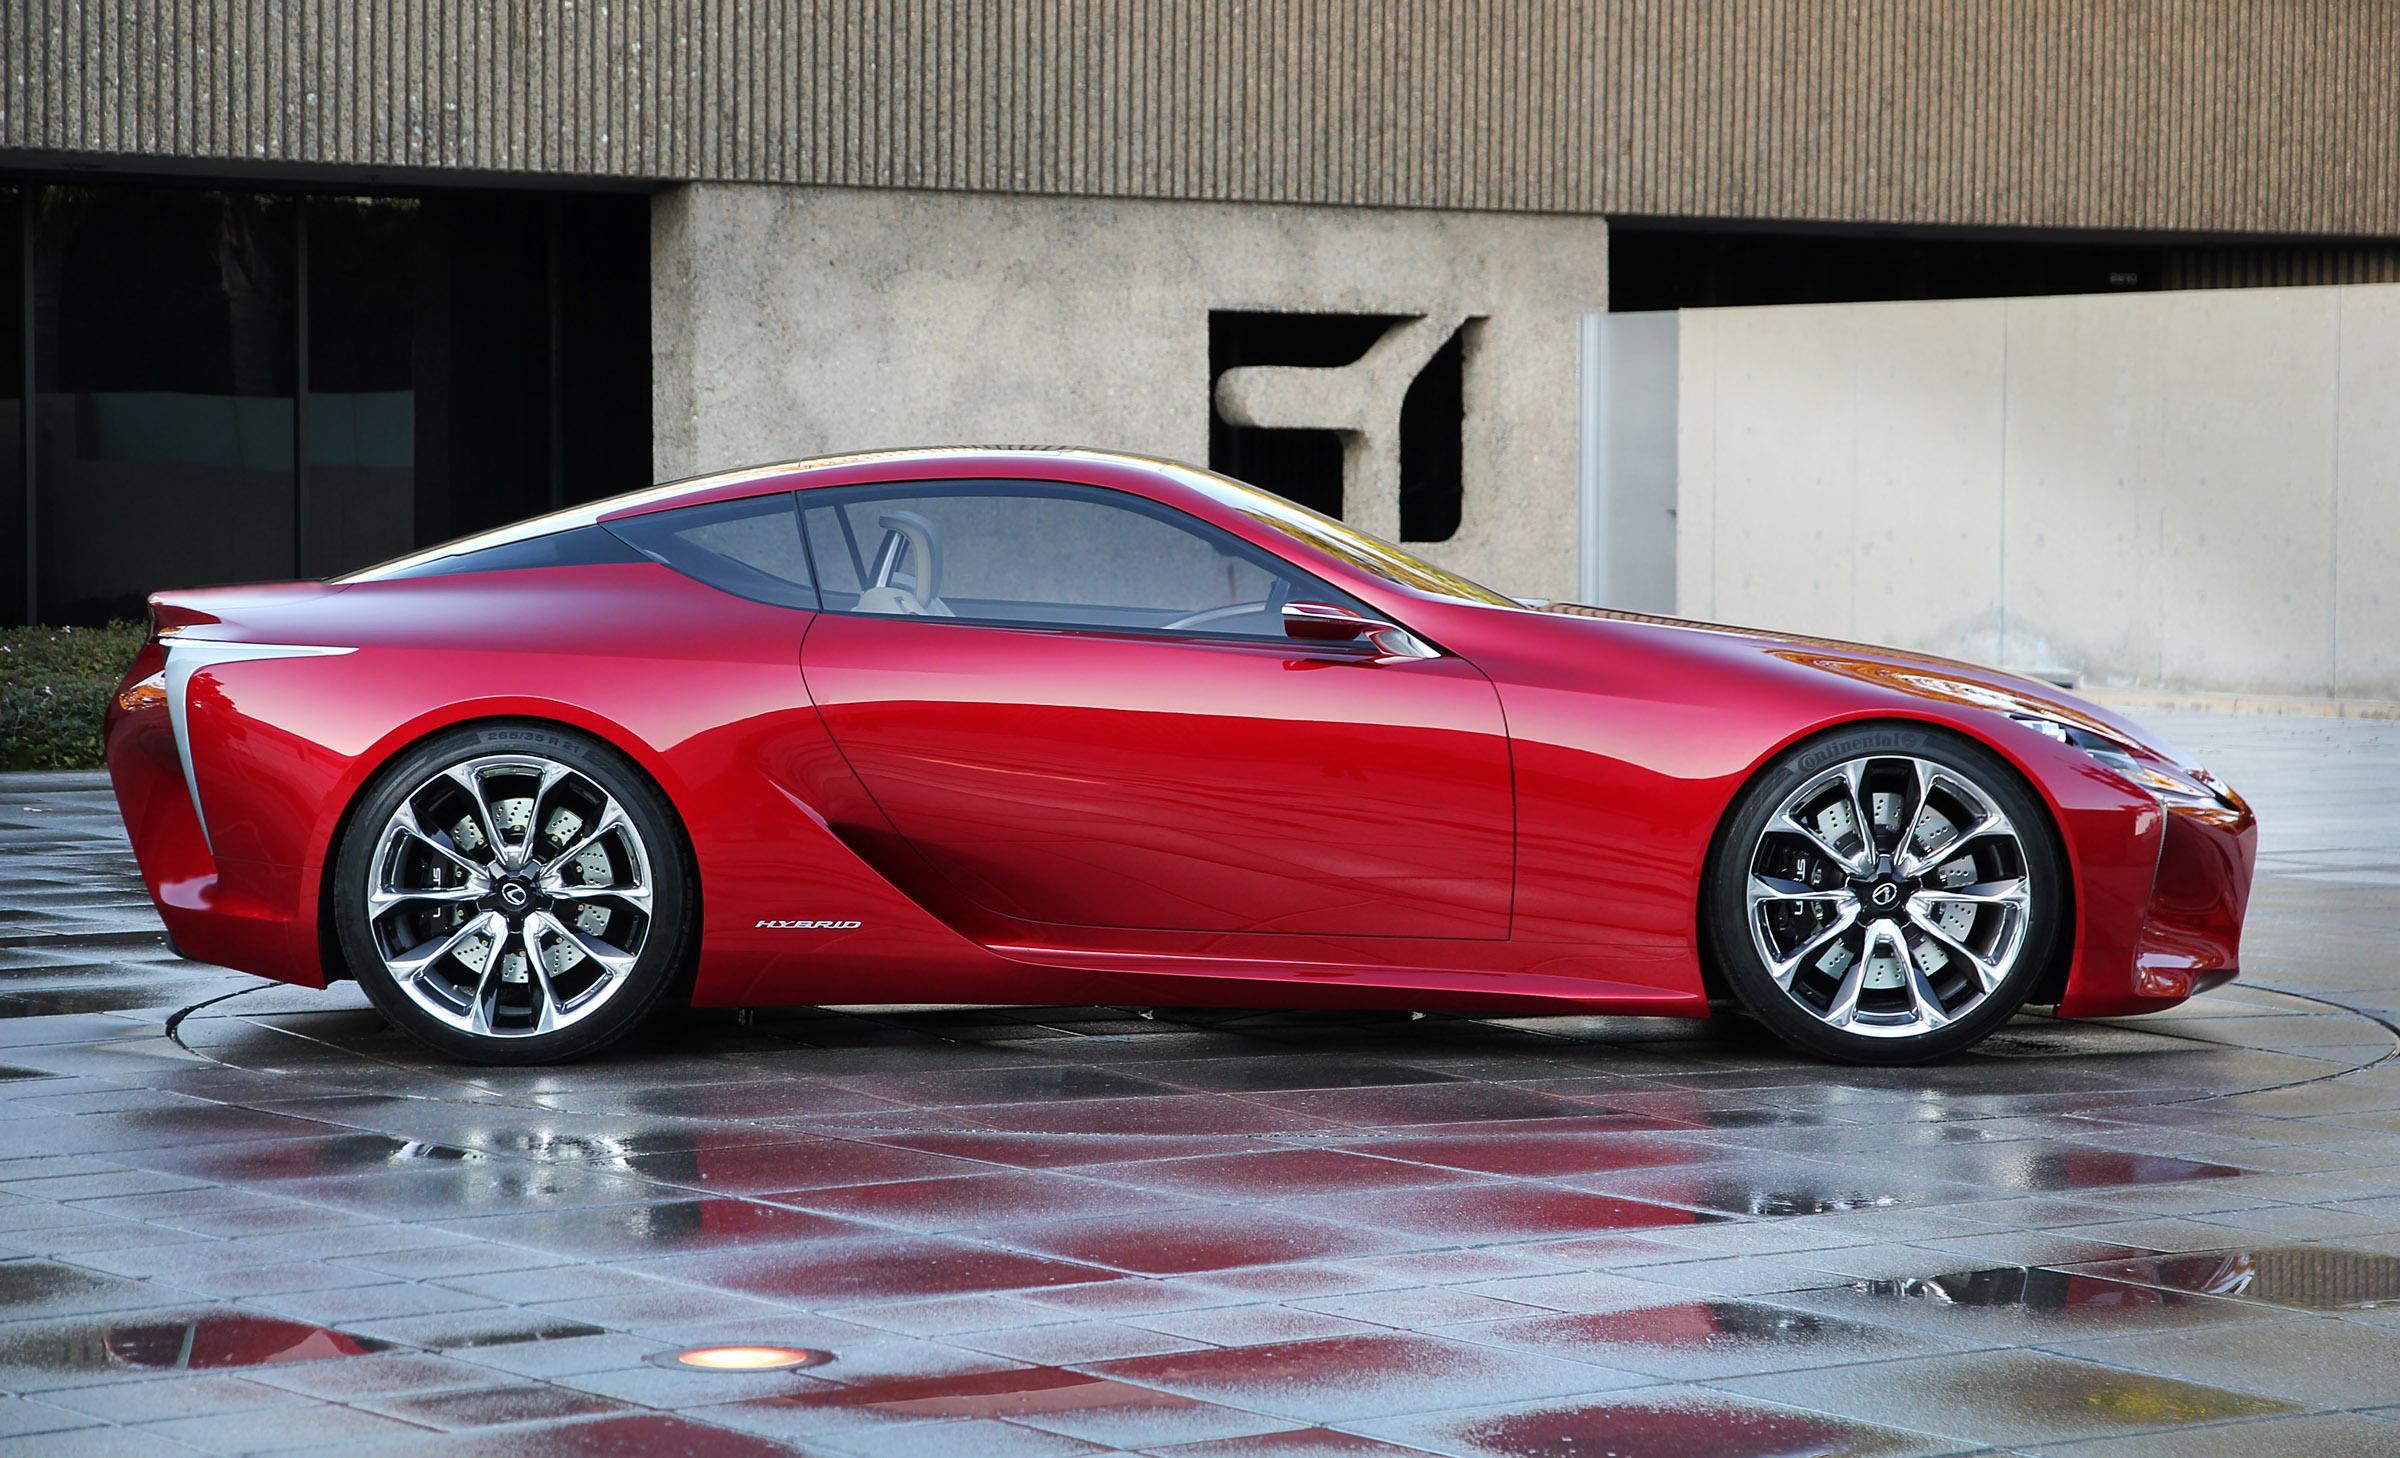 https://www.automobilesreview.com/gallery/2012-lexus-lf-lc-sport-coupe-concept/2012-lexus-lf-lc-sport-coupe-concept-28.jpg